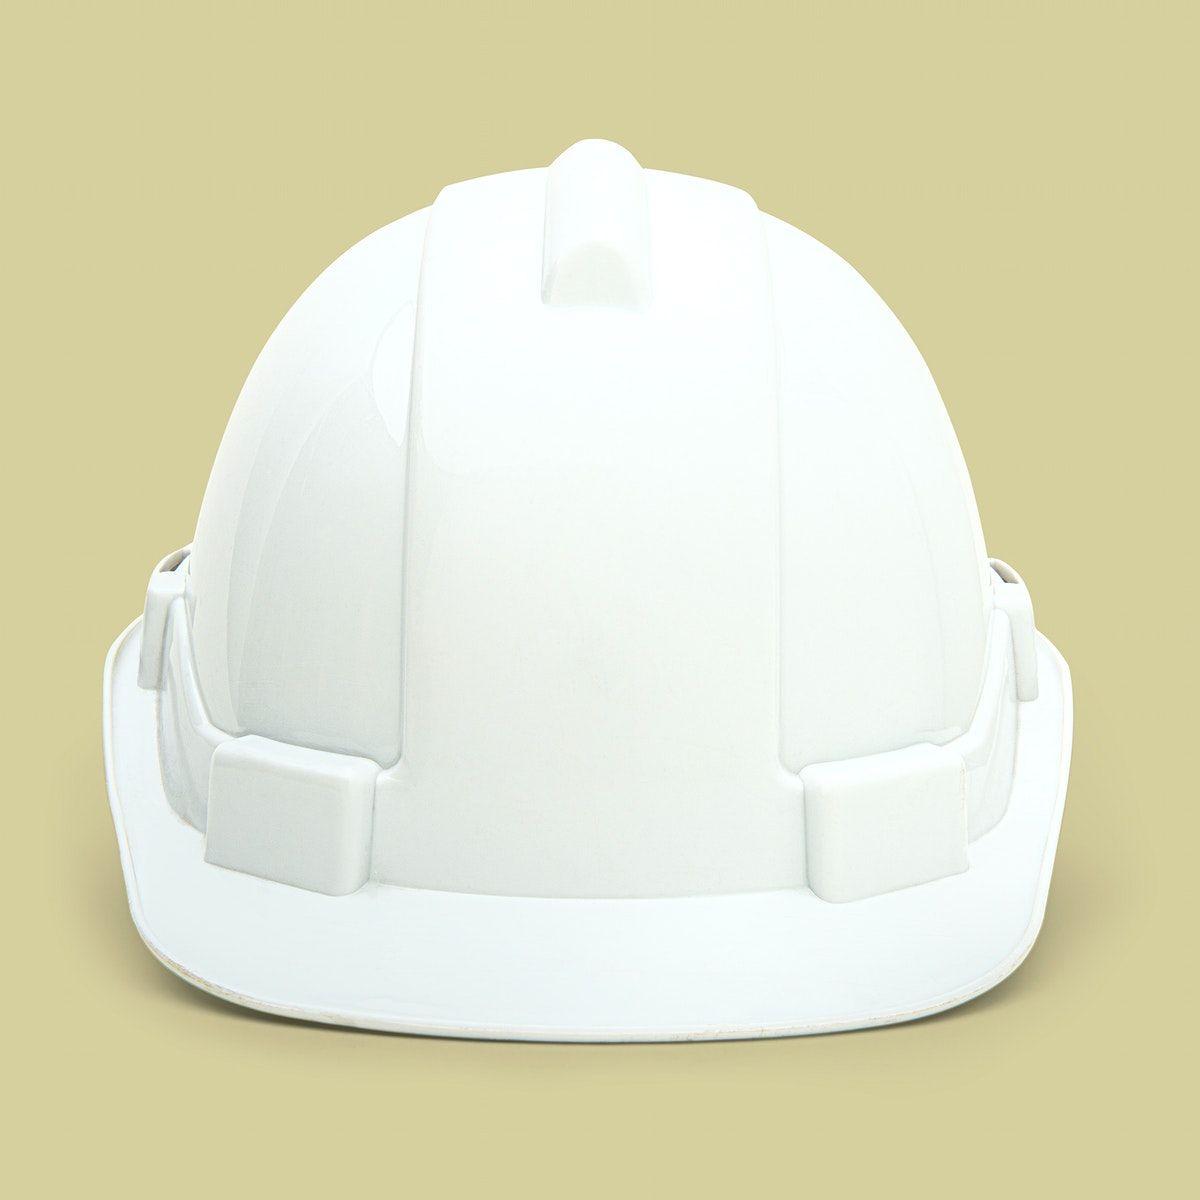 Download Premium Illustration Of White Hard Hat On Beige Background 2437343 Beige Background Beige Hard Hat